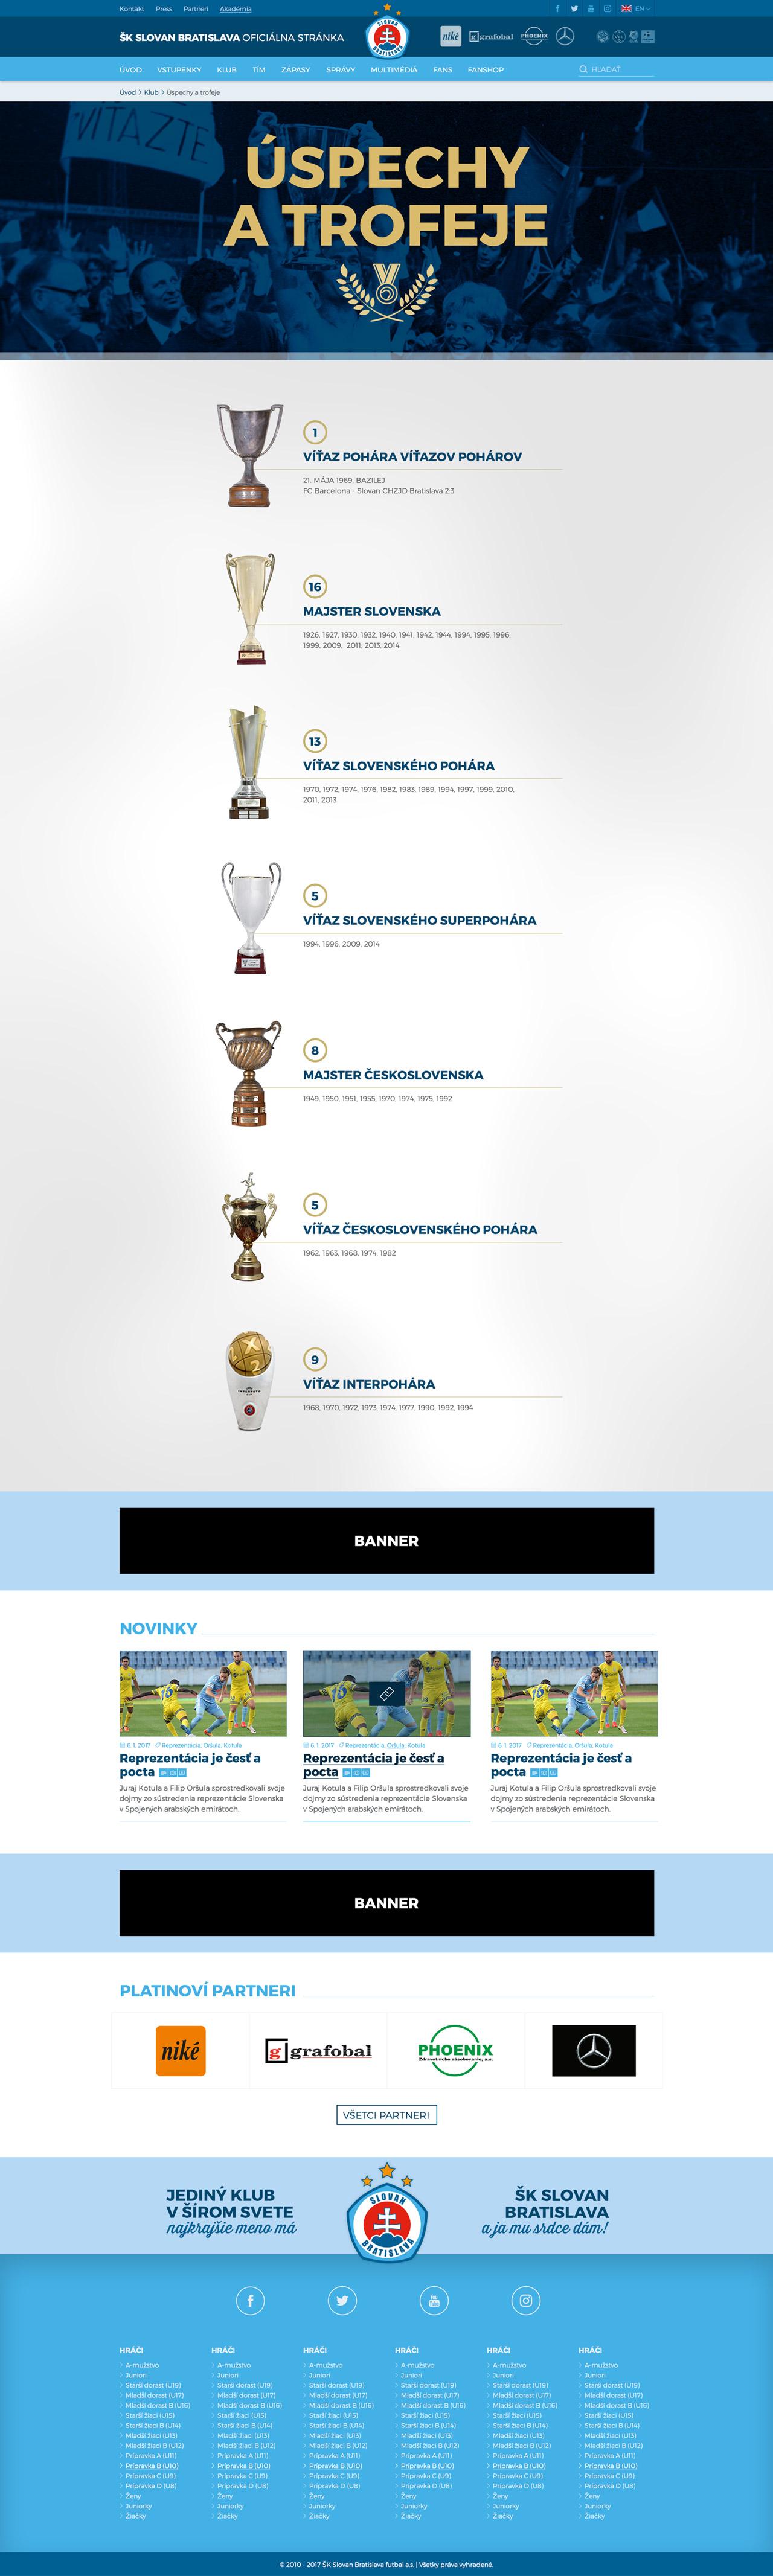 SKSLOVAN.com - úspechy a trofeje